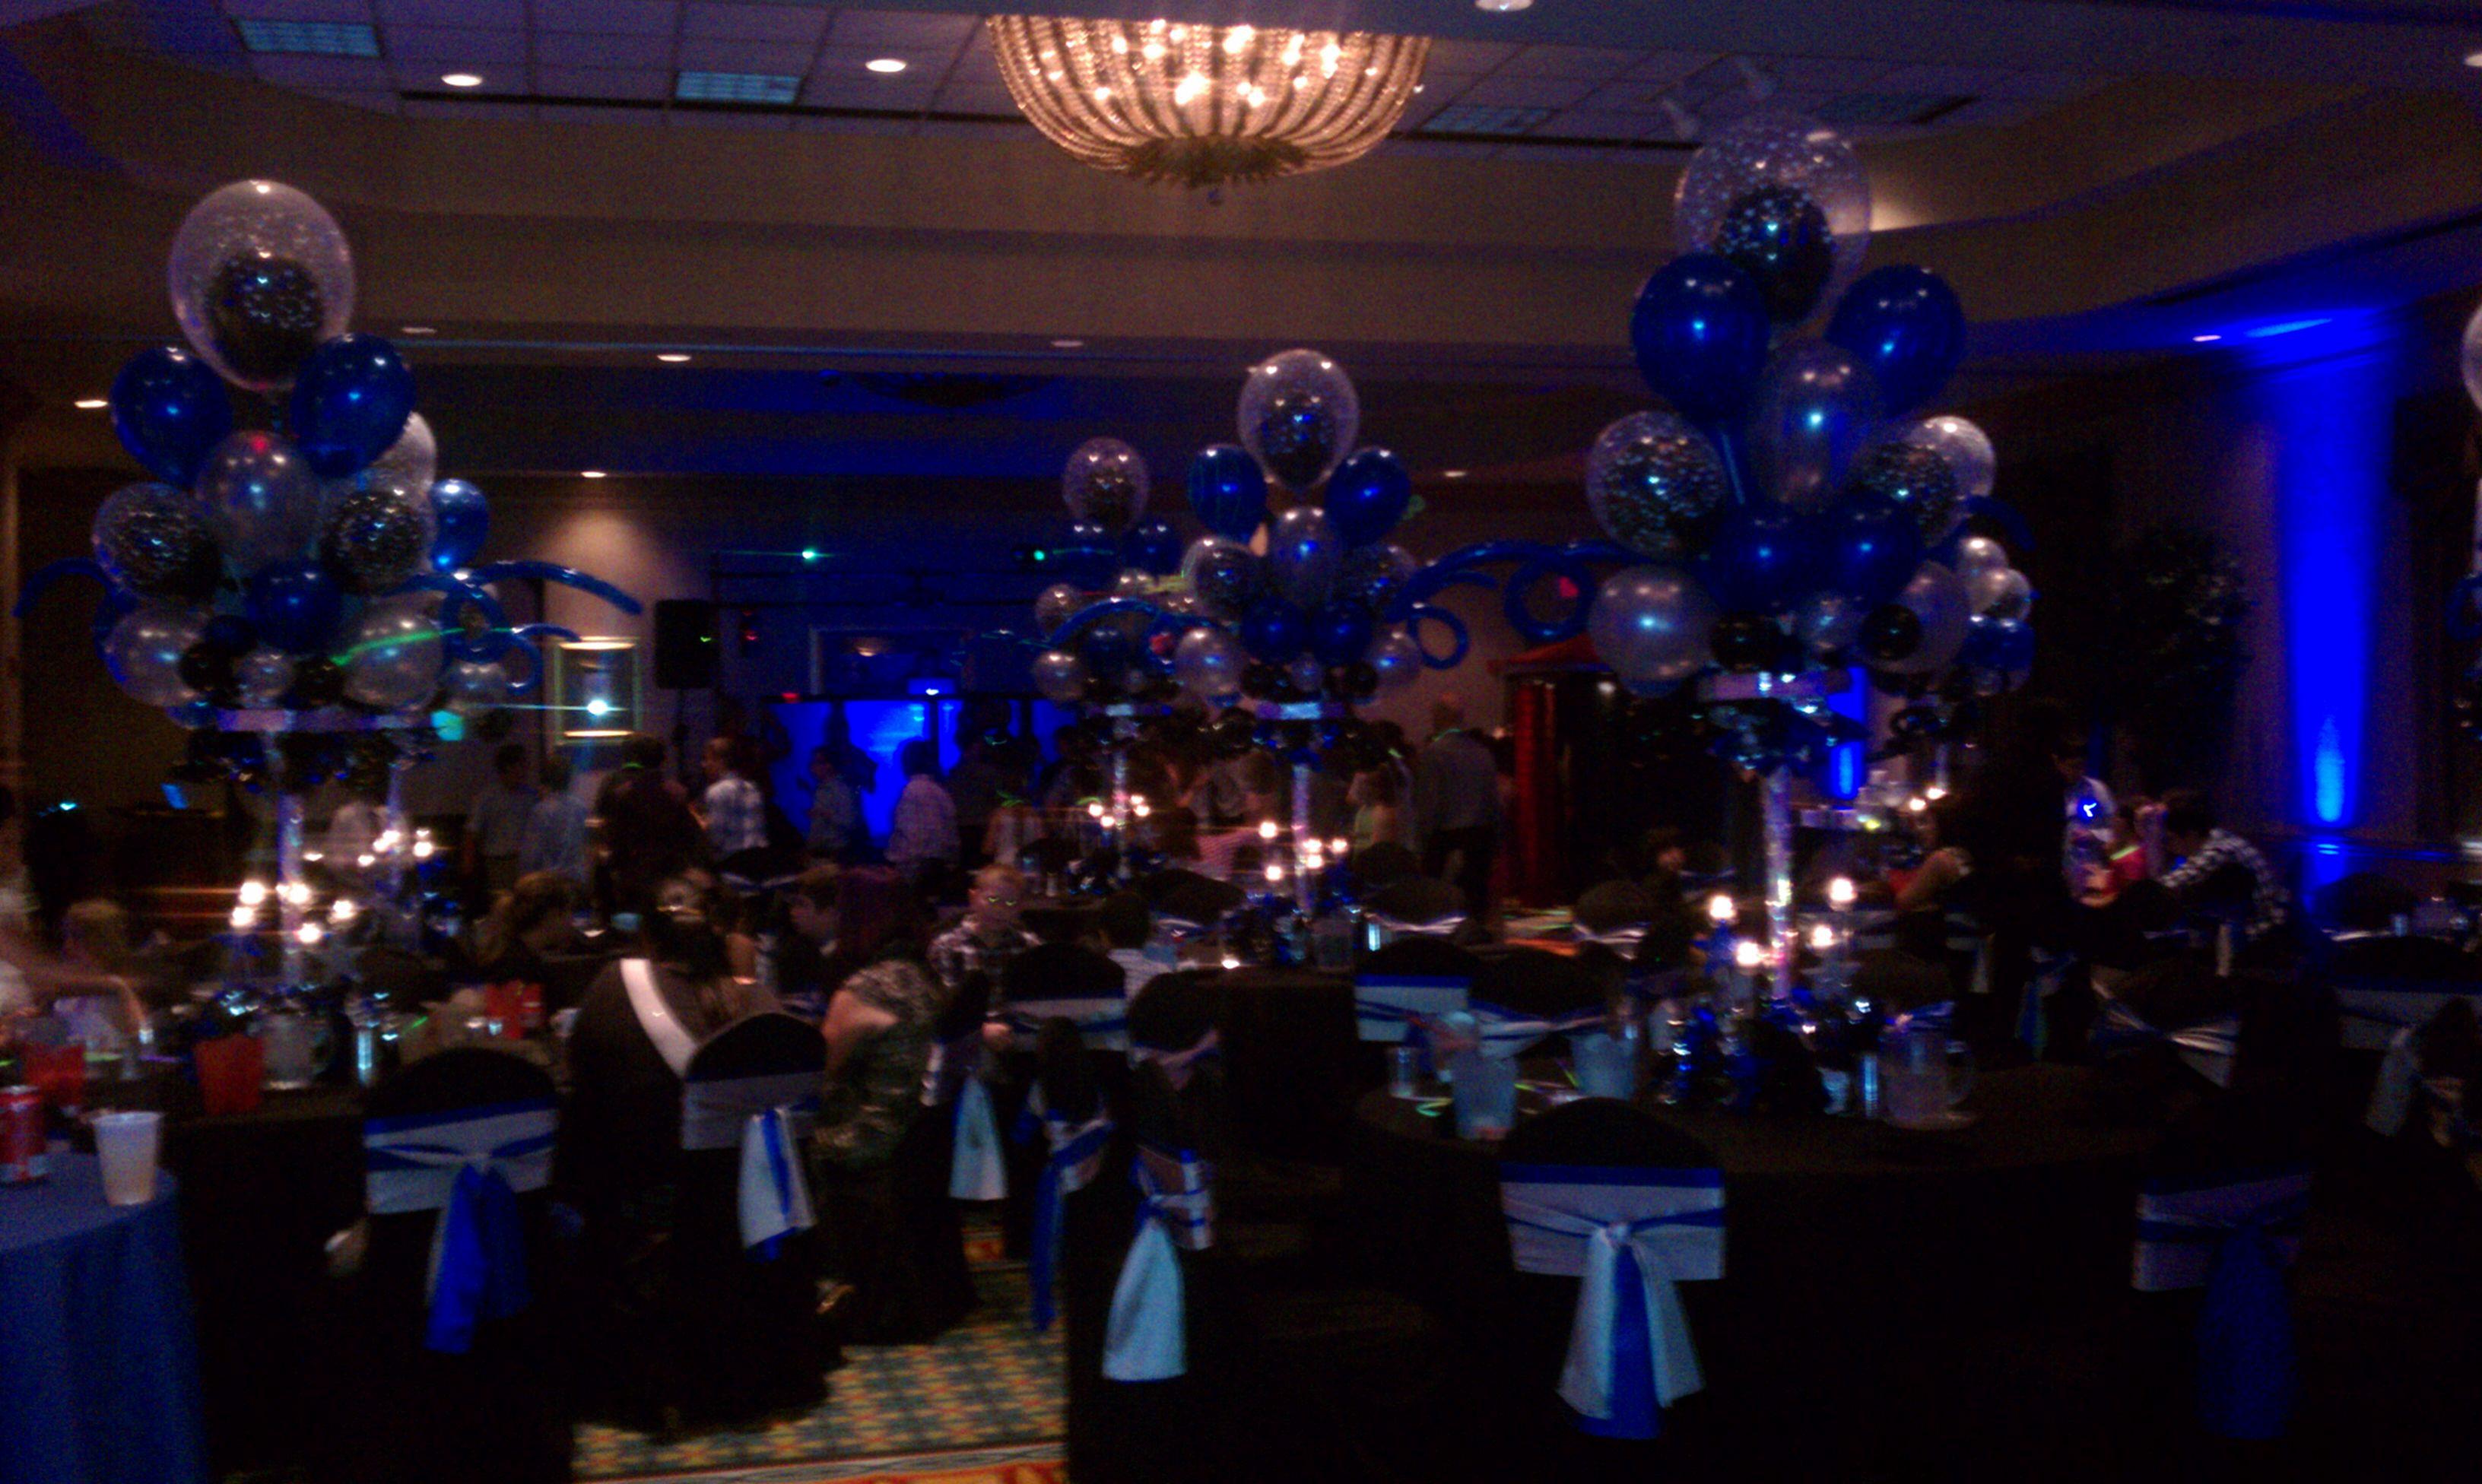 Blue, White, Silver, & Light Ballons